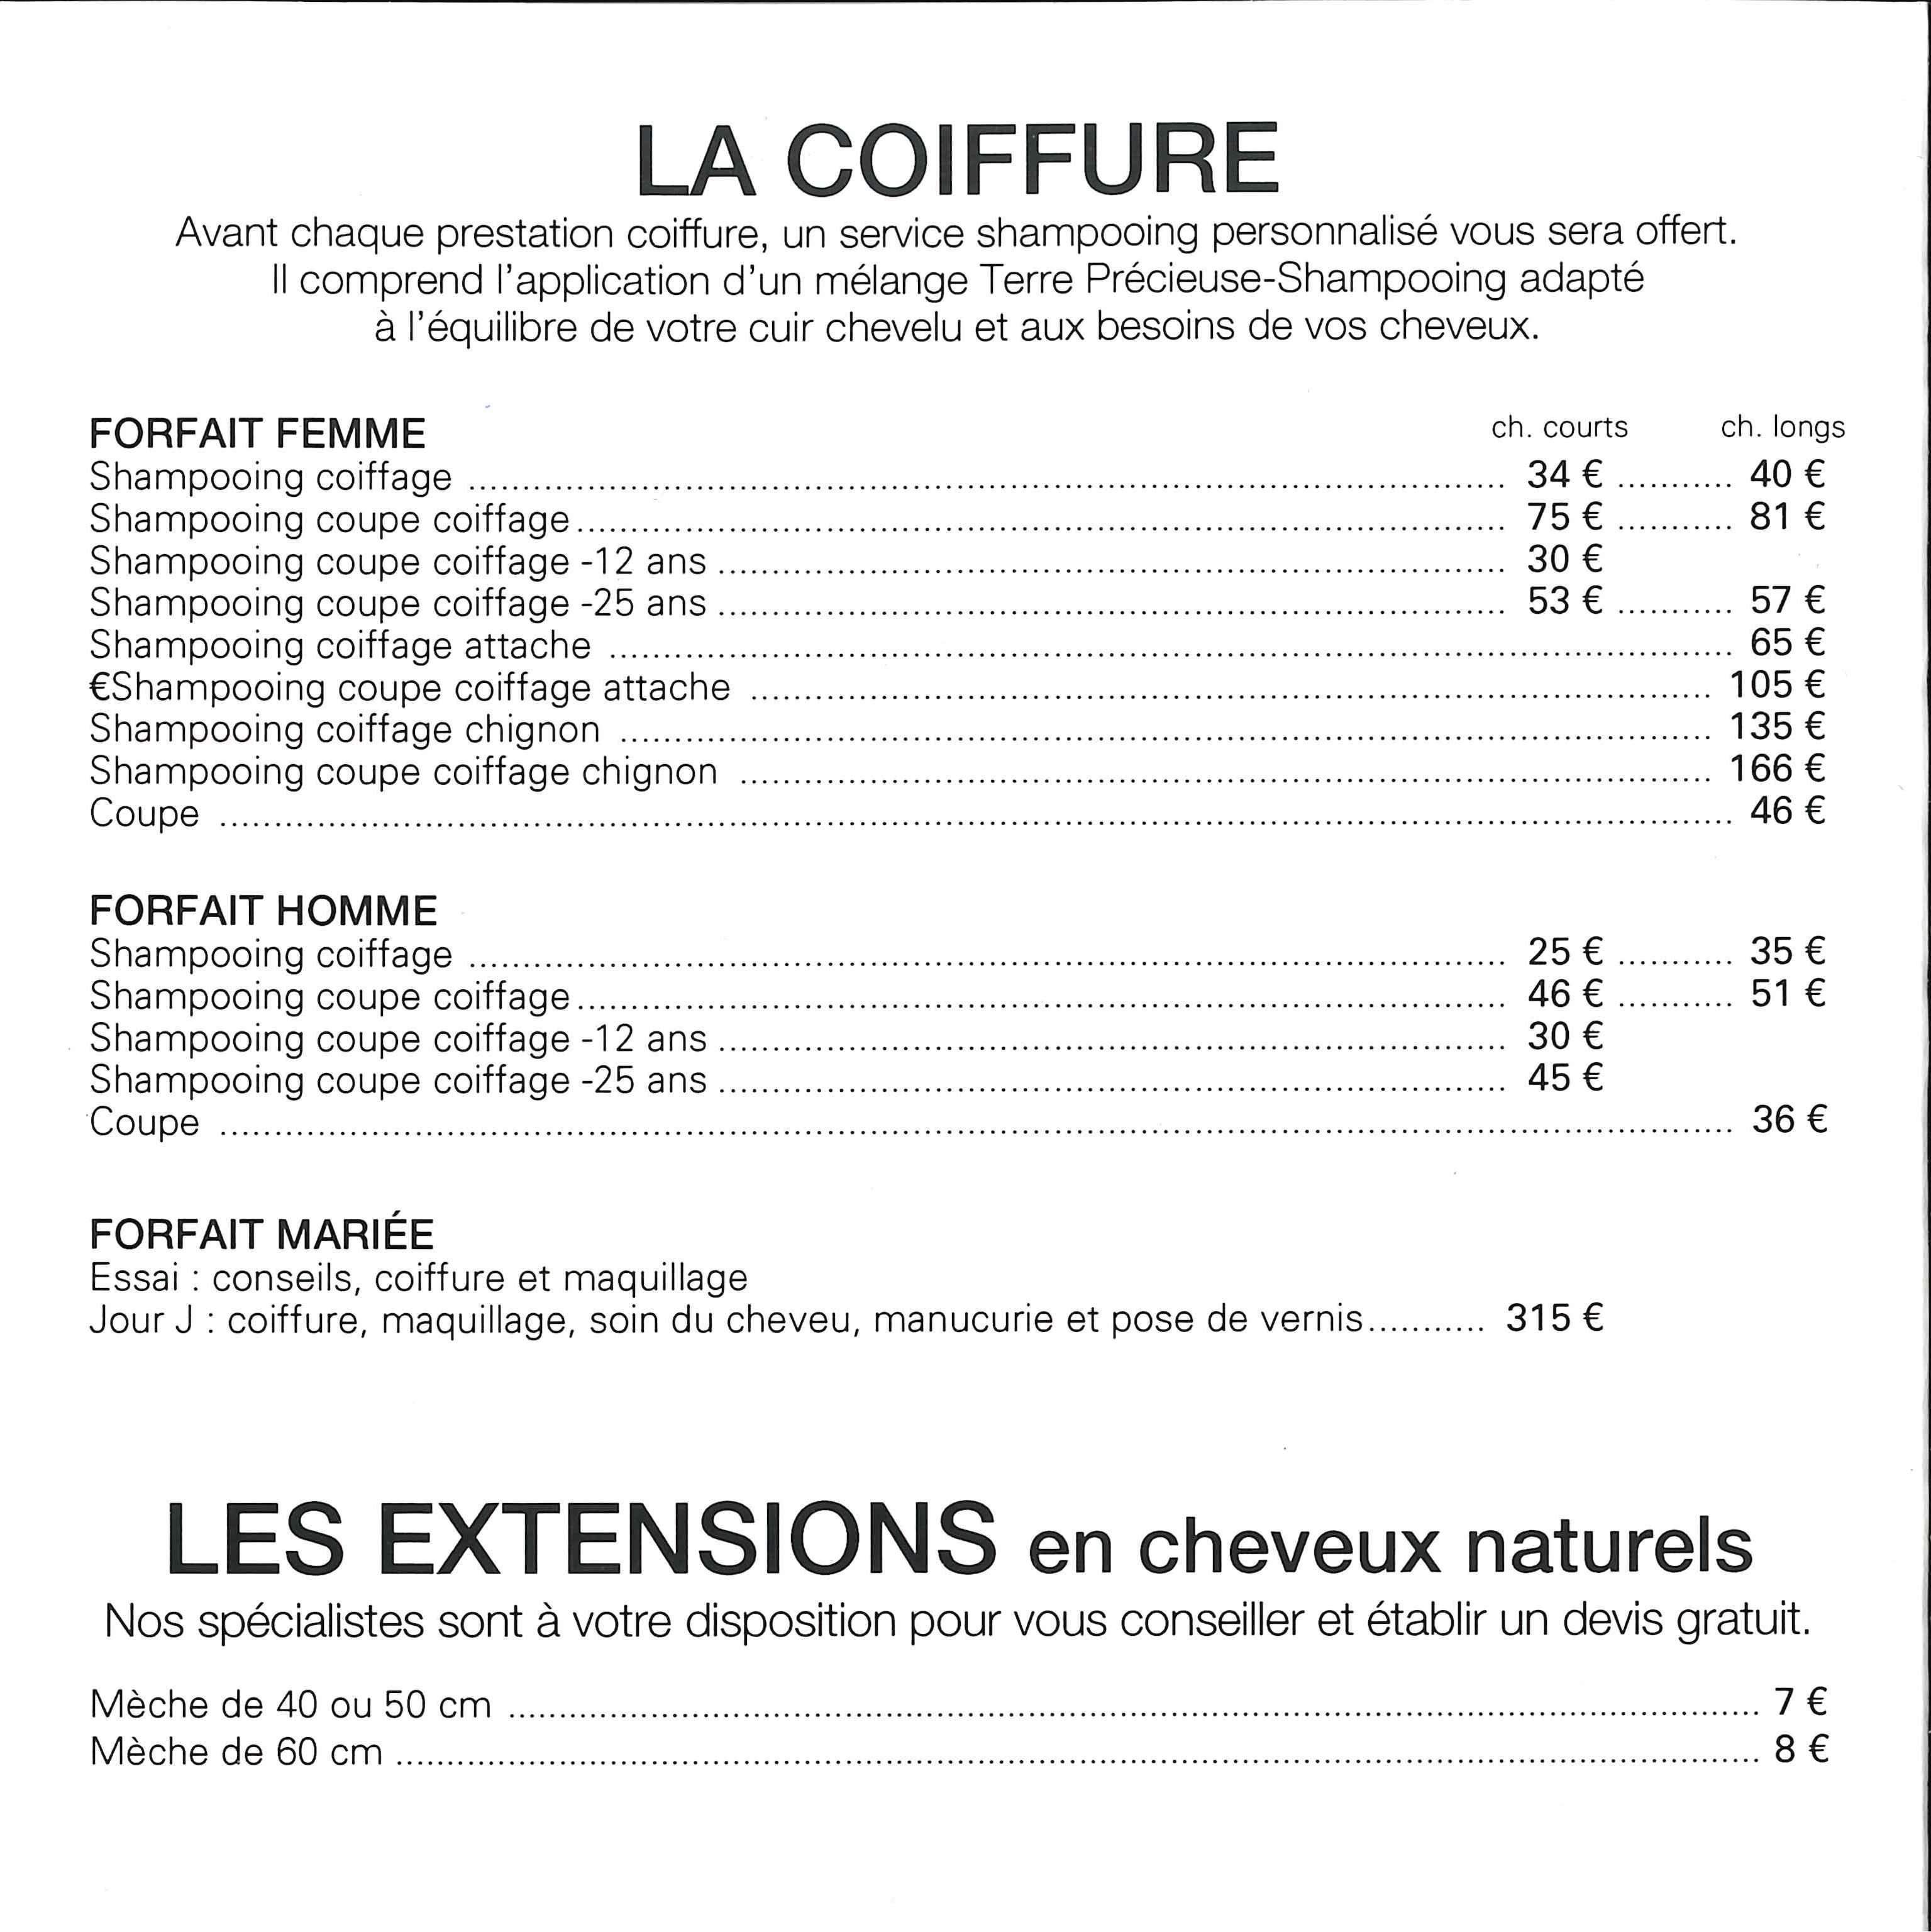 Dessange - Marché aux Herbes | Hair Salon - hairdresser | Brussels ...